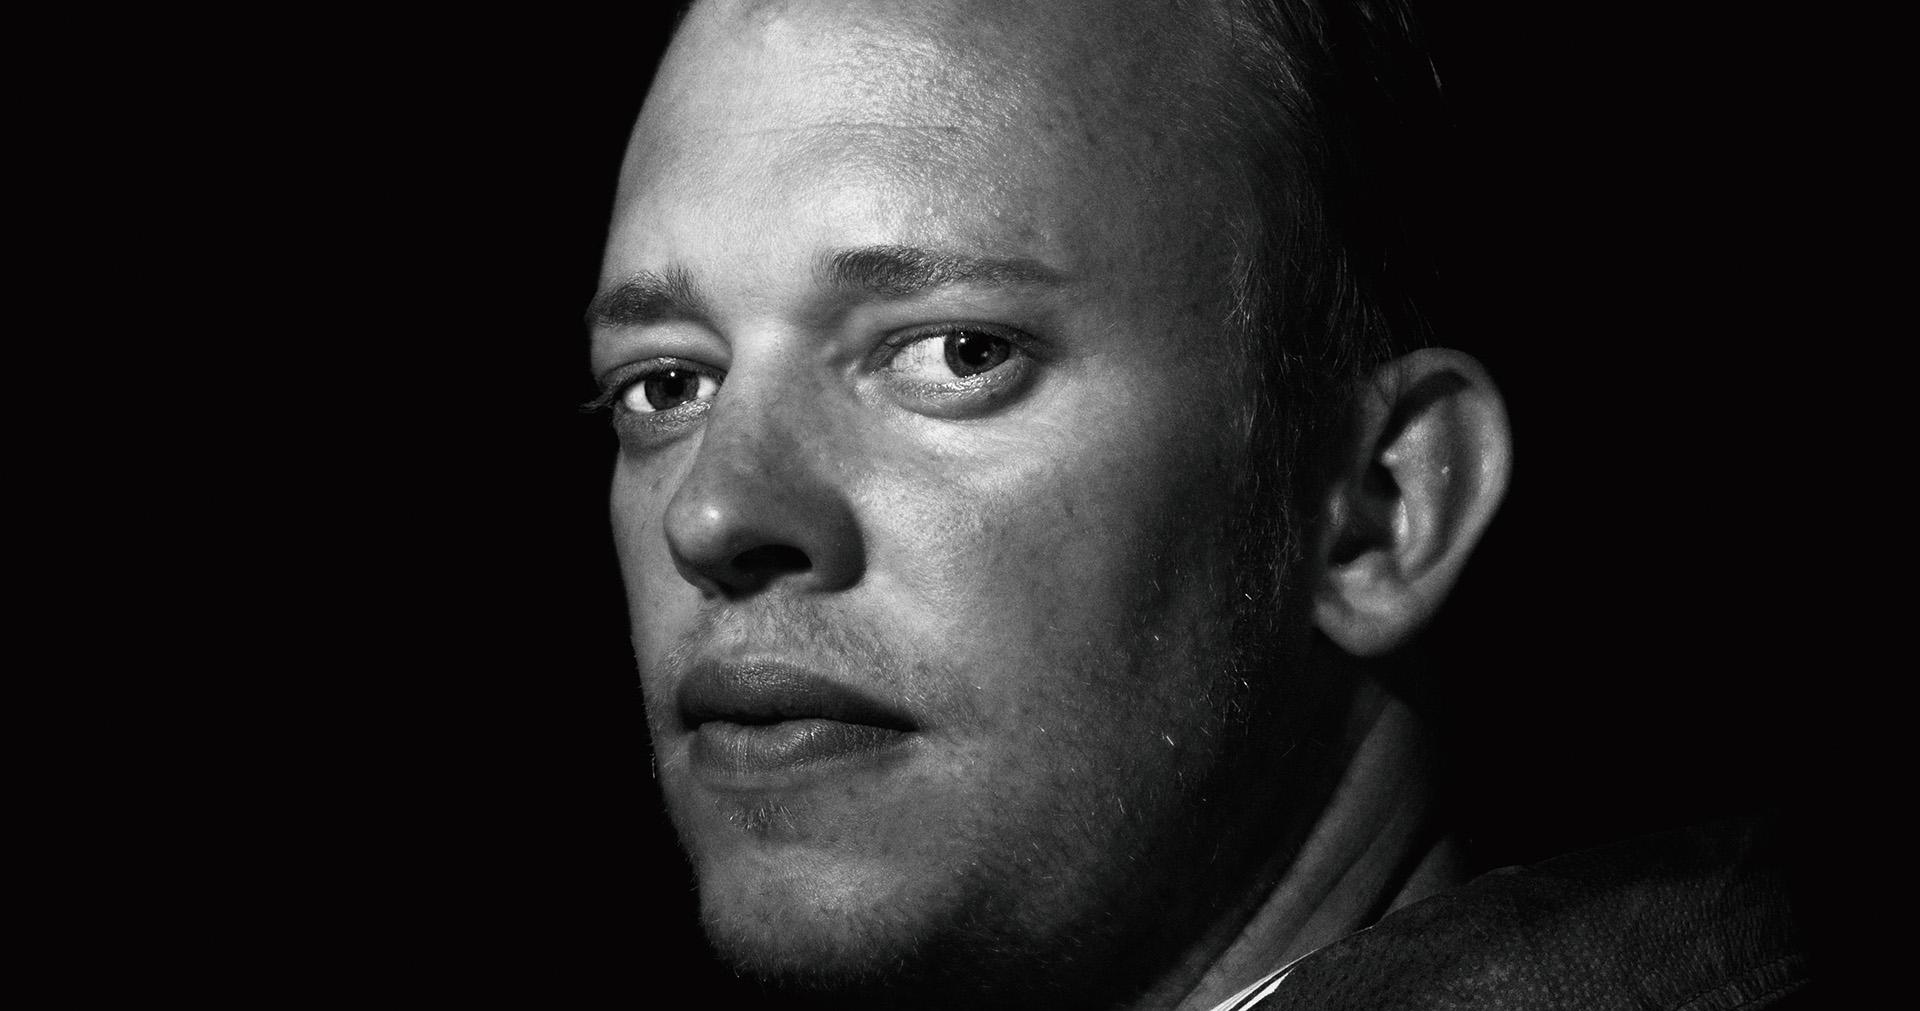 Portrait photography, Corporate headshots